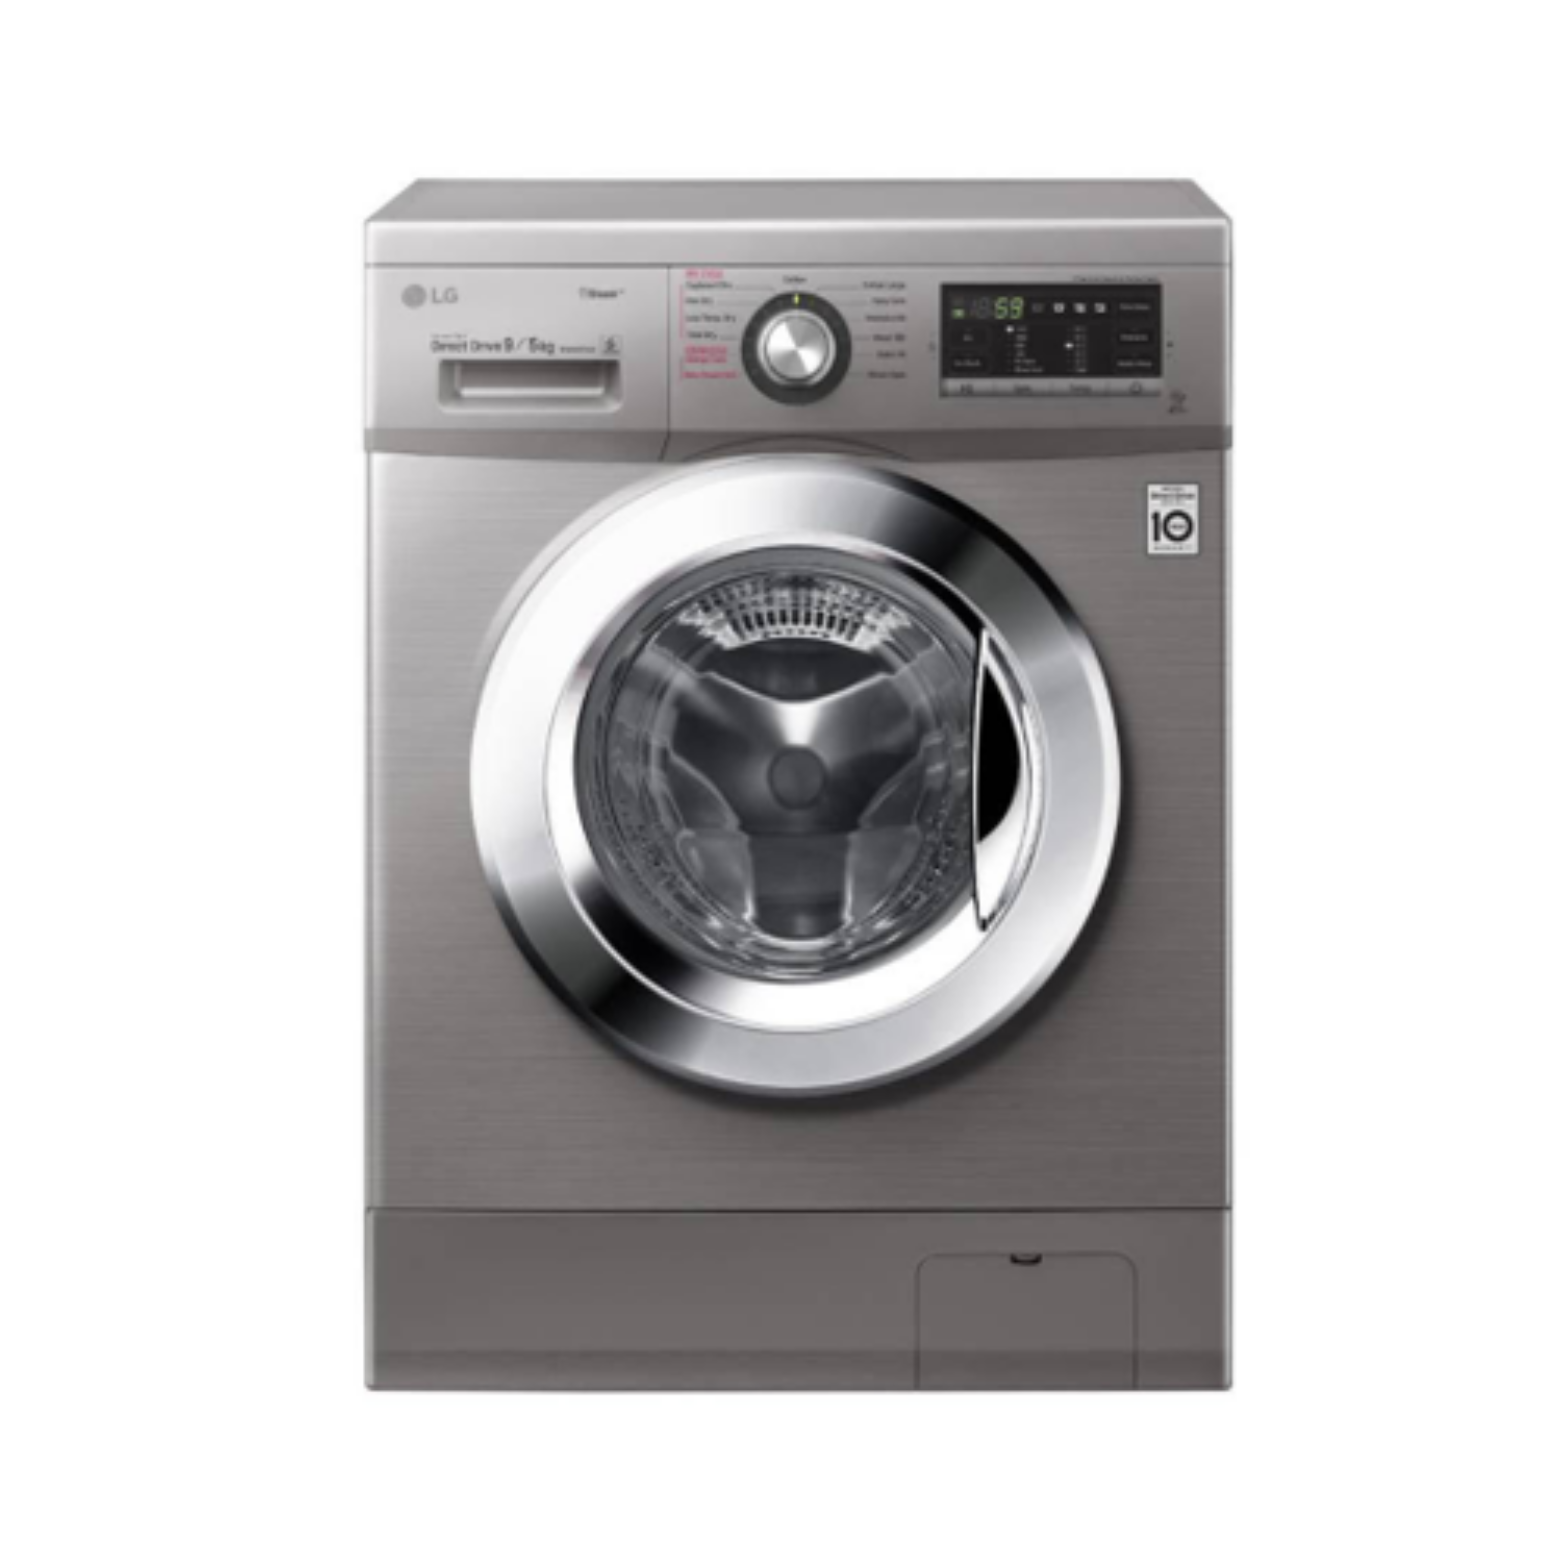 LG Washing Machine FH4G6VDGG6 in Kenya 9KG Front Load Washer